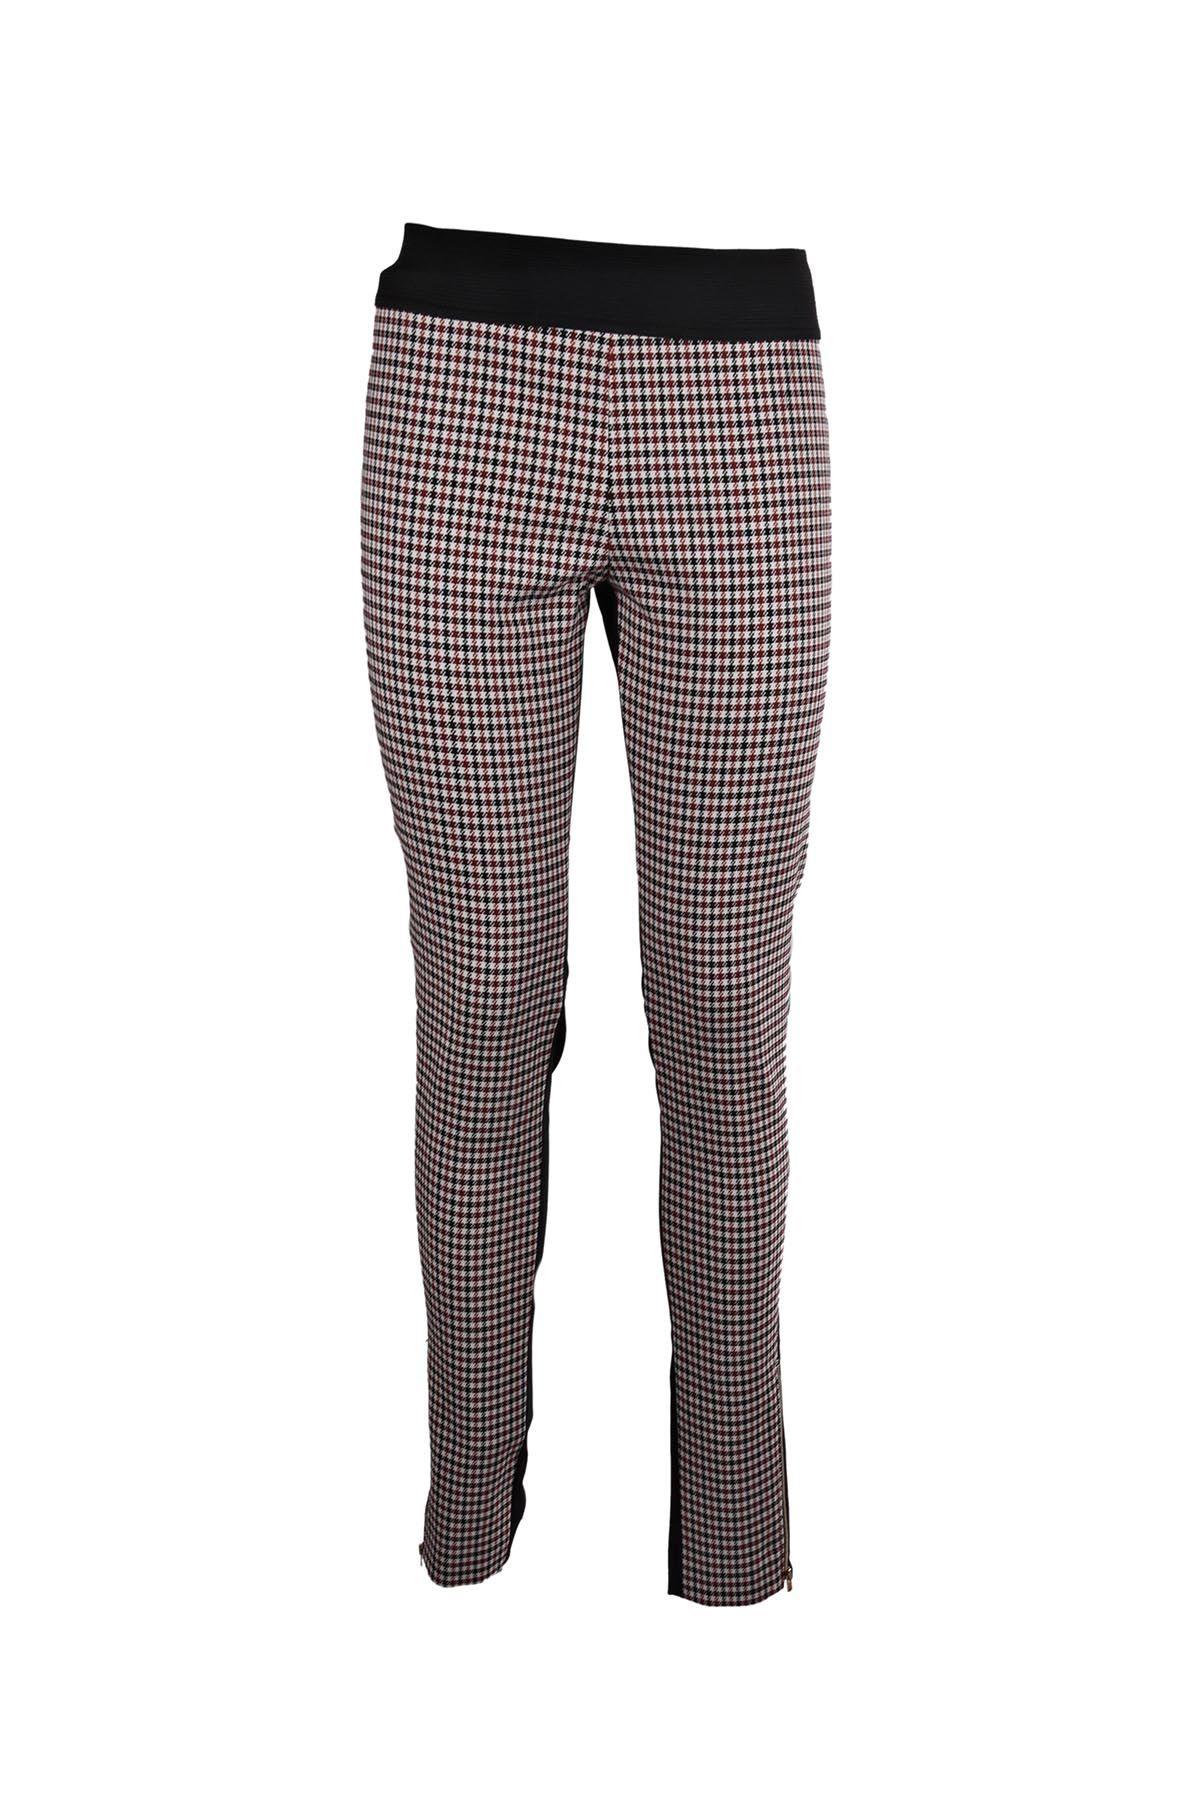 Stella McCartney Mccartney Plaid Front Leggings